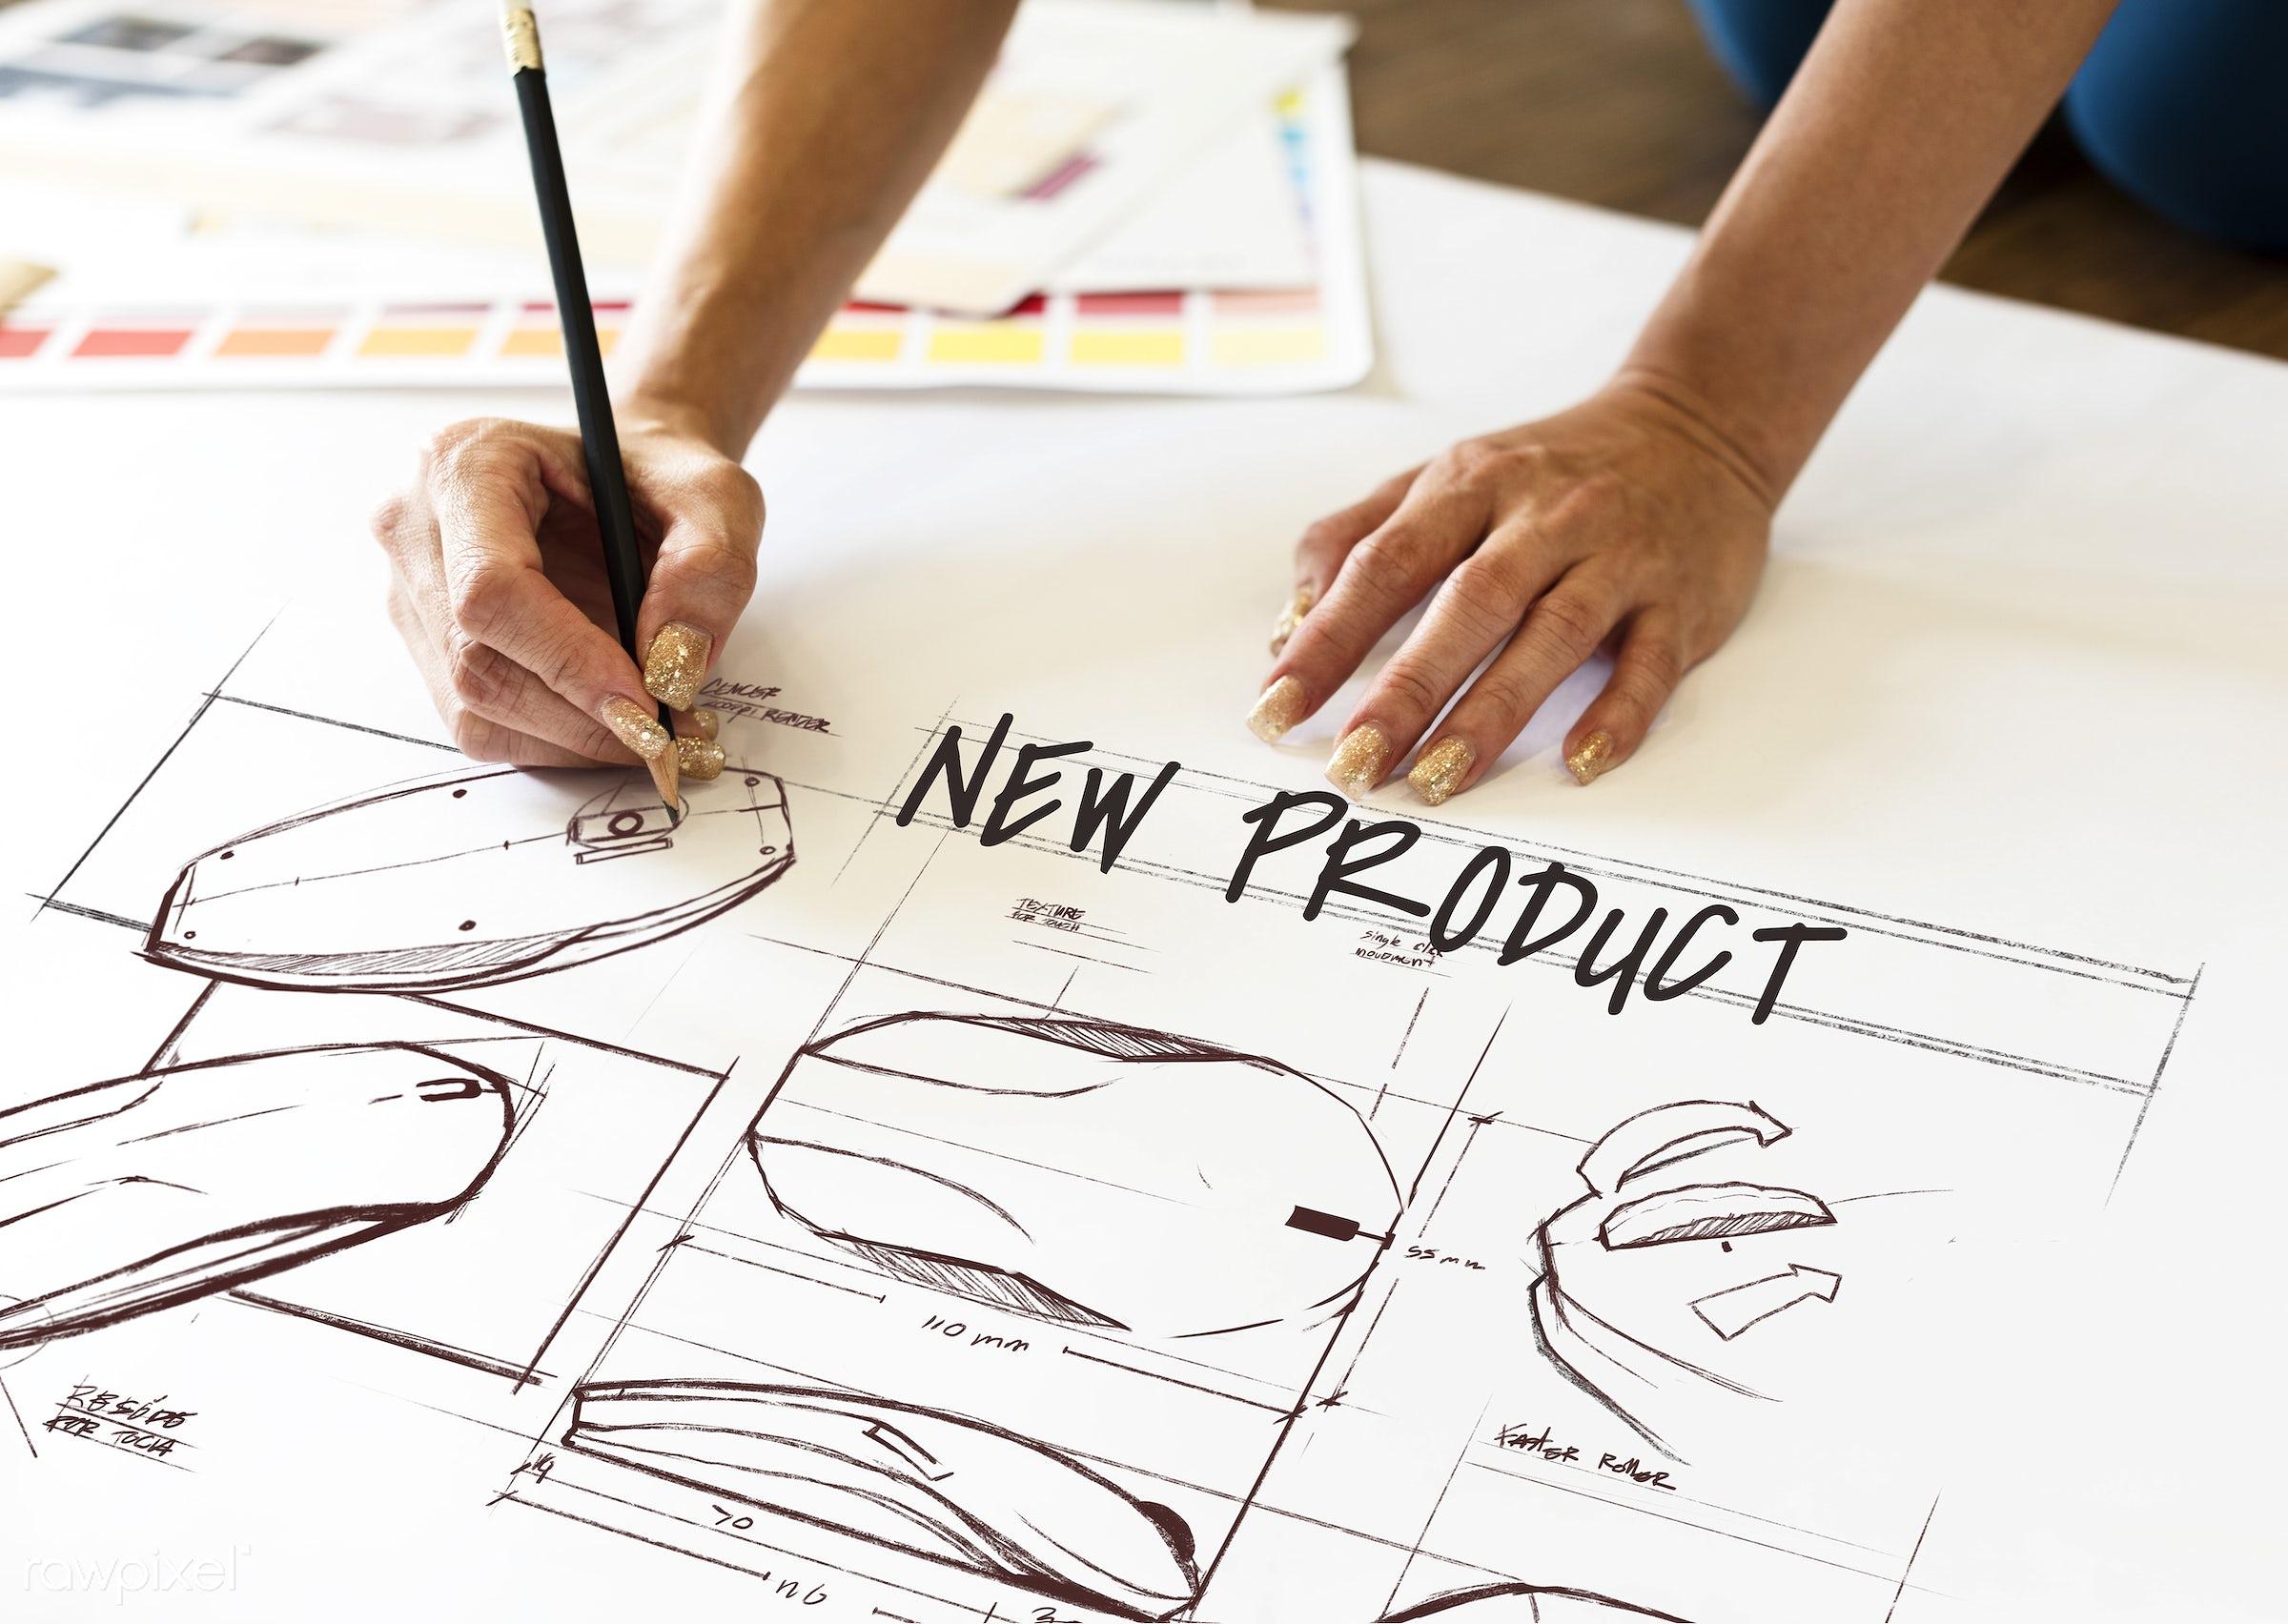 art, brainstorming, commercialization, computer mouse, concept, creation, creative, creativity, design, development, drawing...